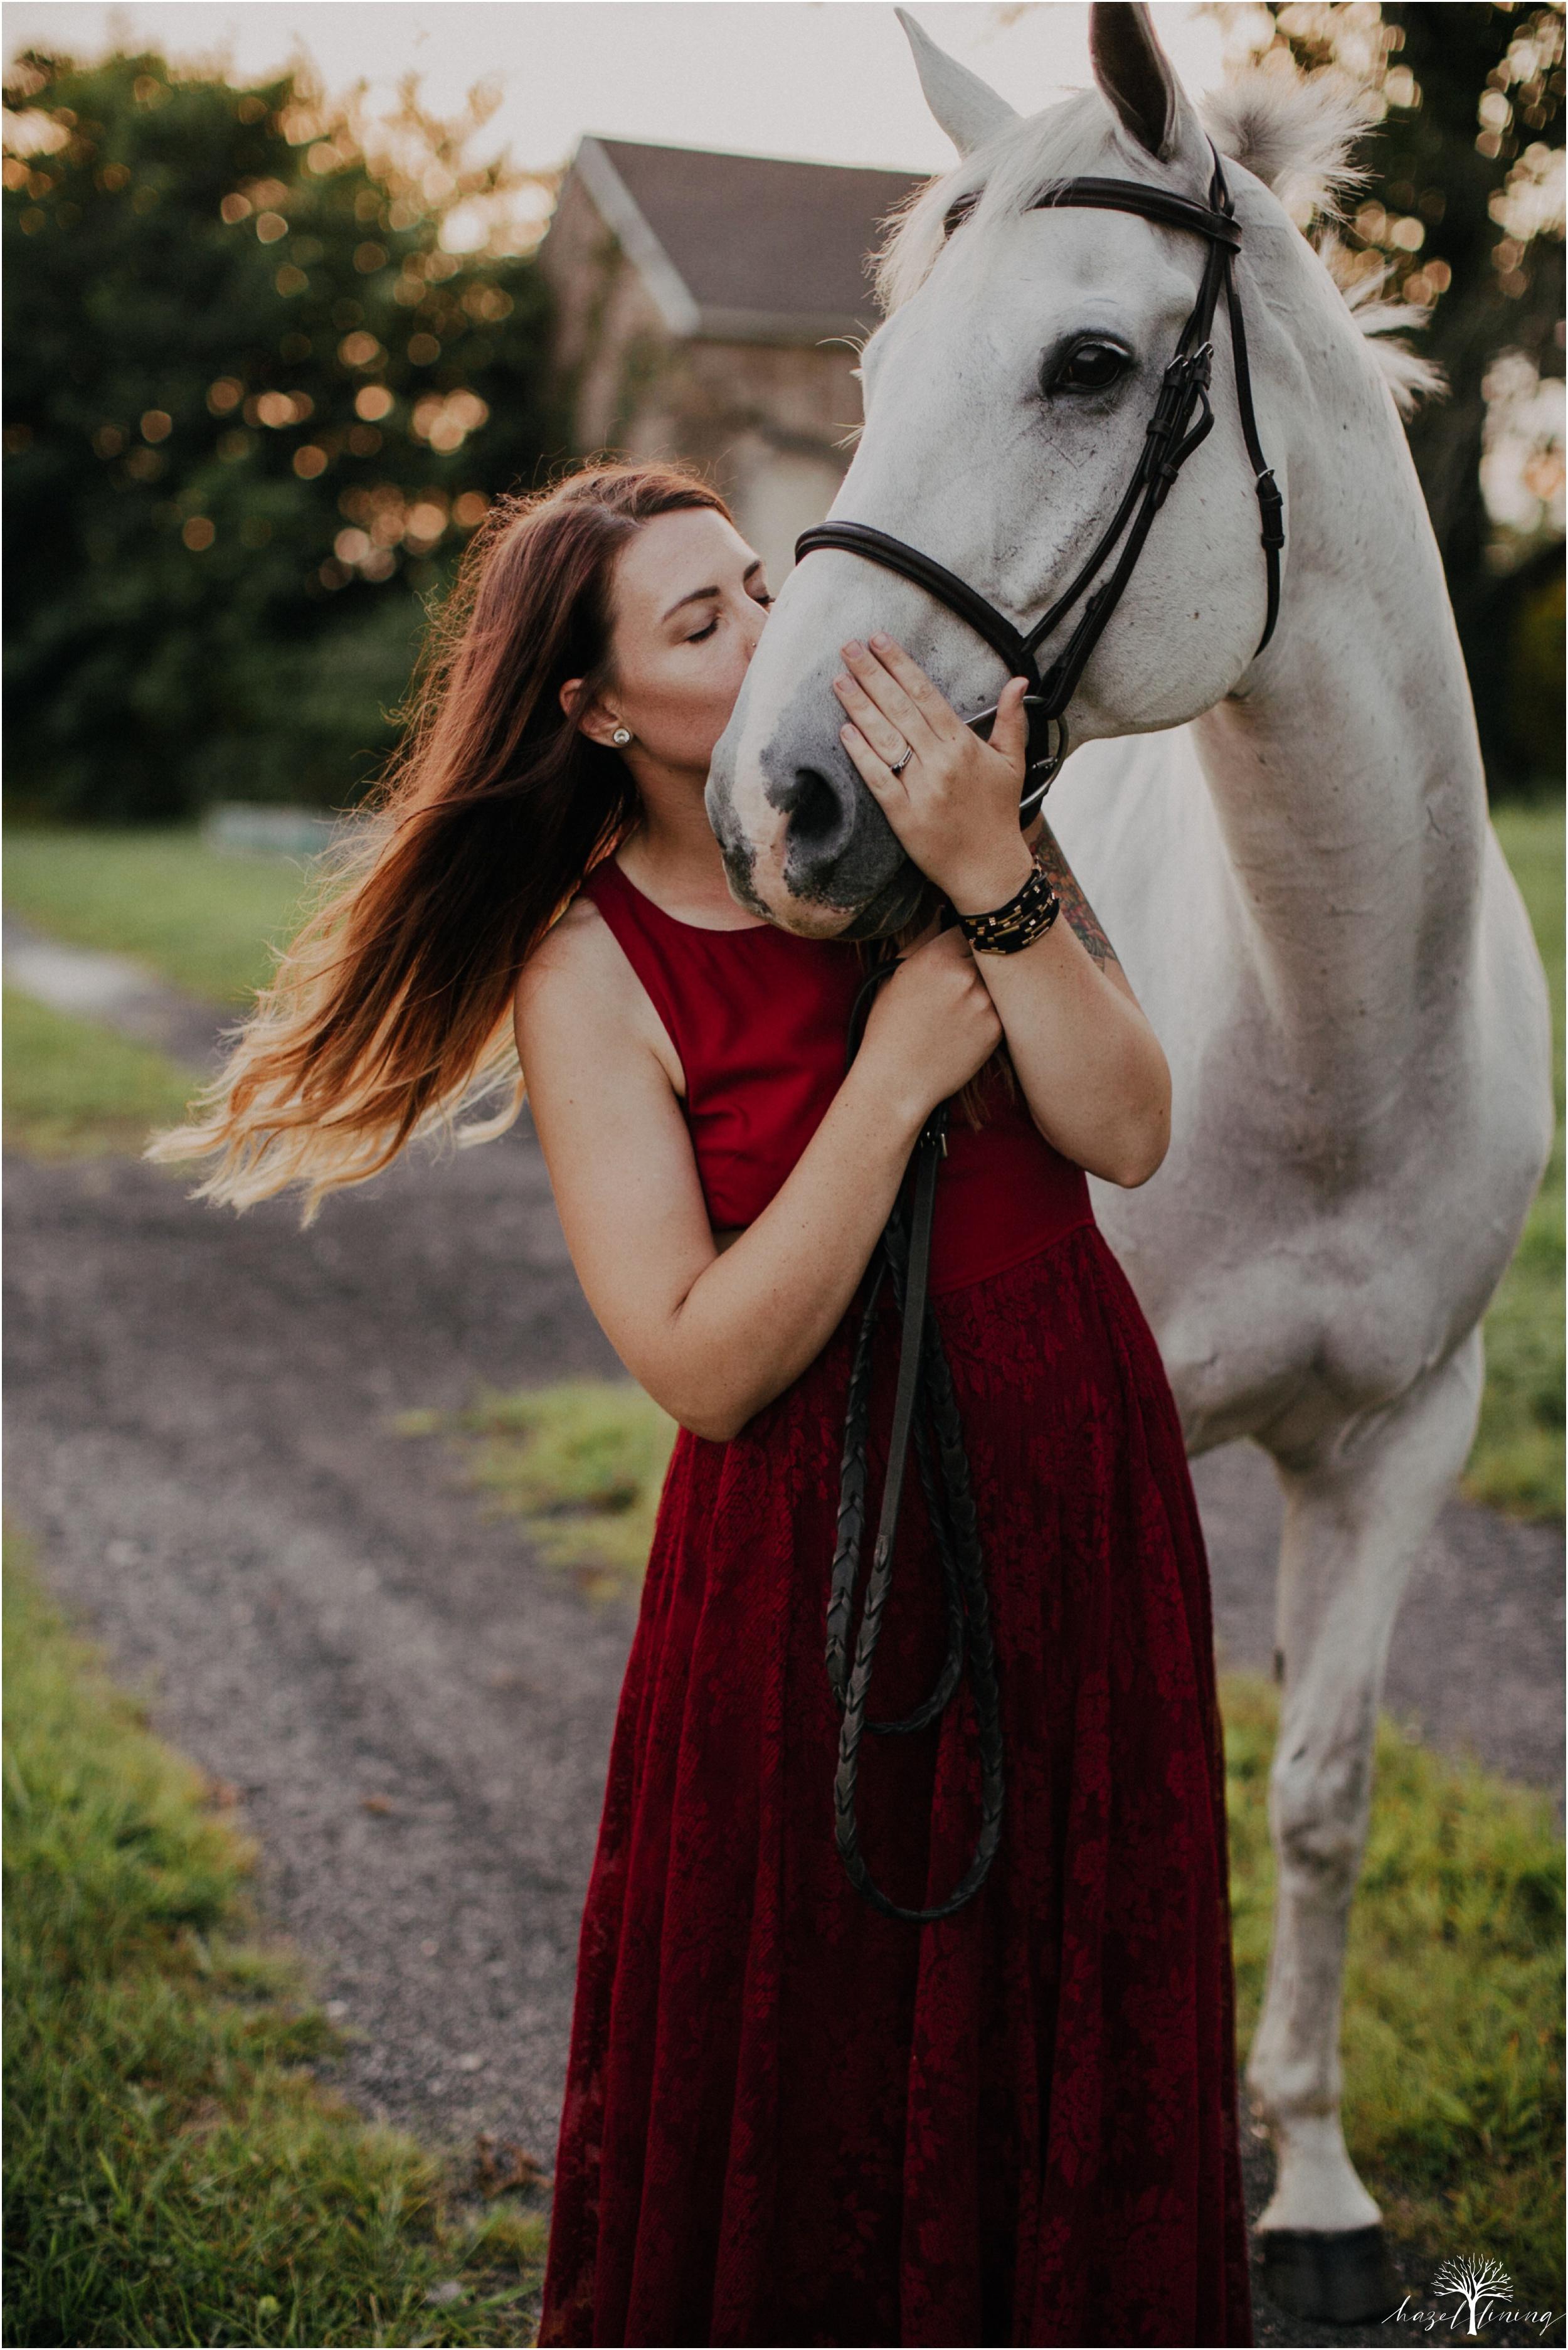 taylor-adams-and-horse-delaware-valley-university-delval-summer-equestrian-portrait-session-hazel-lining-photography-destination-elopement-wedding-engagement-photography_0063.jpg